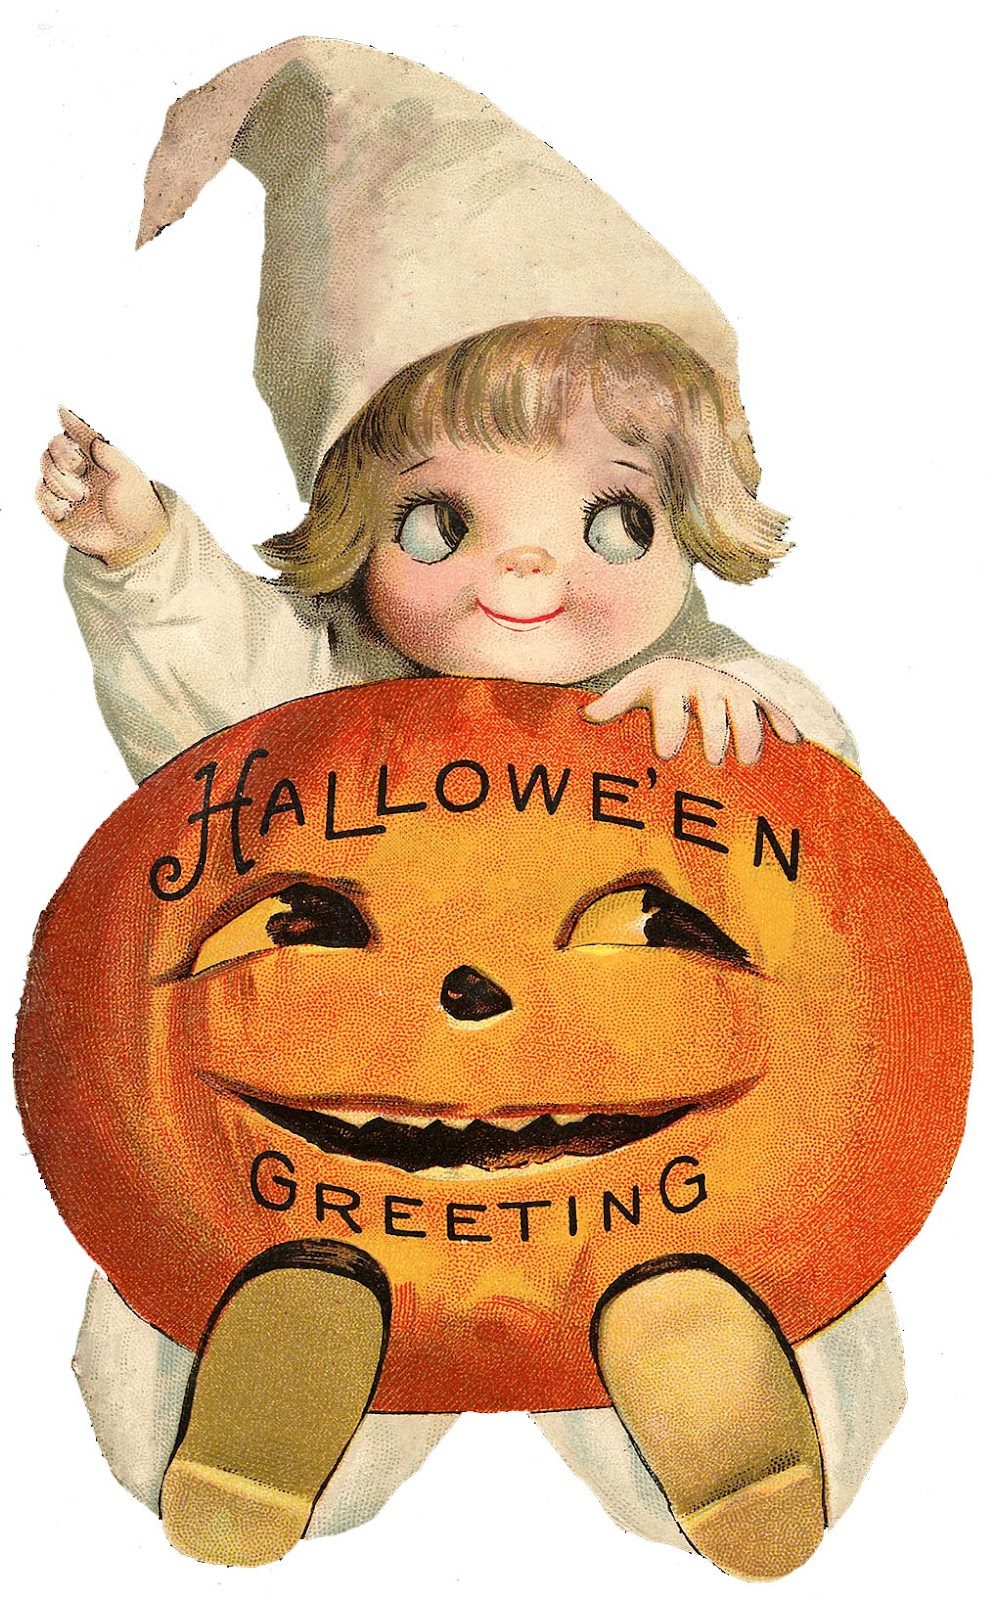 Vintage Halloween Clip Art U2013 Googly -Vintage Halloween Clip Art u2013 Googly Eye Pumpkin Girl-14